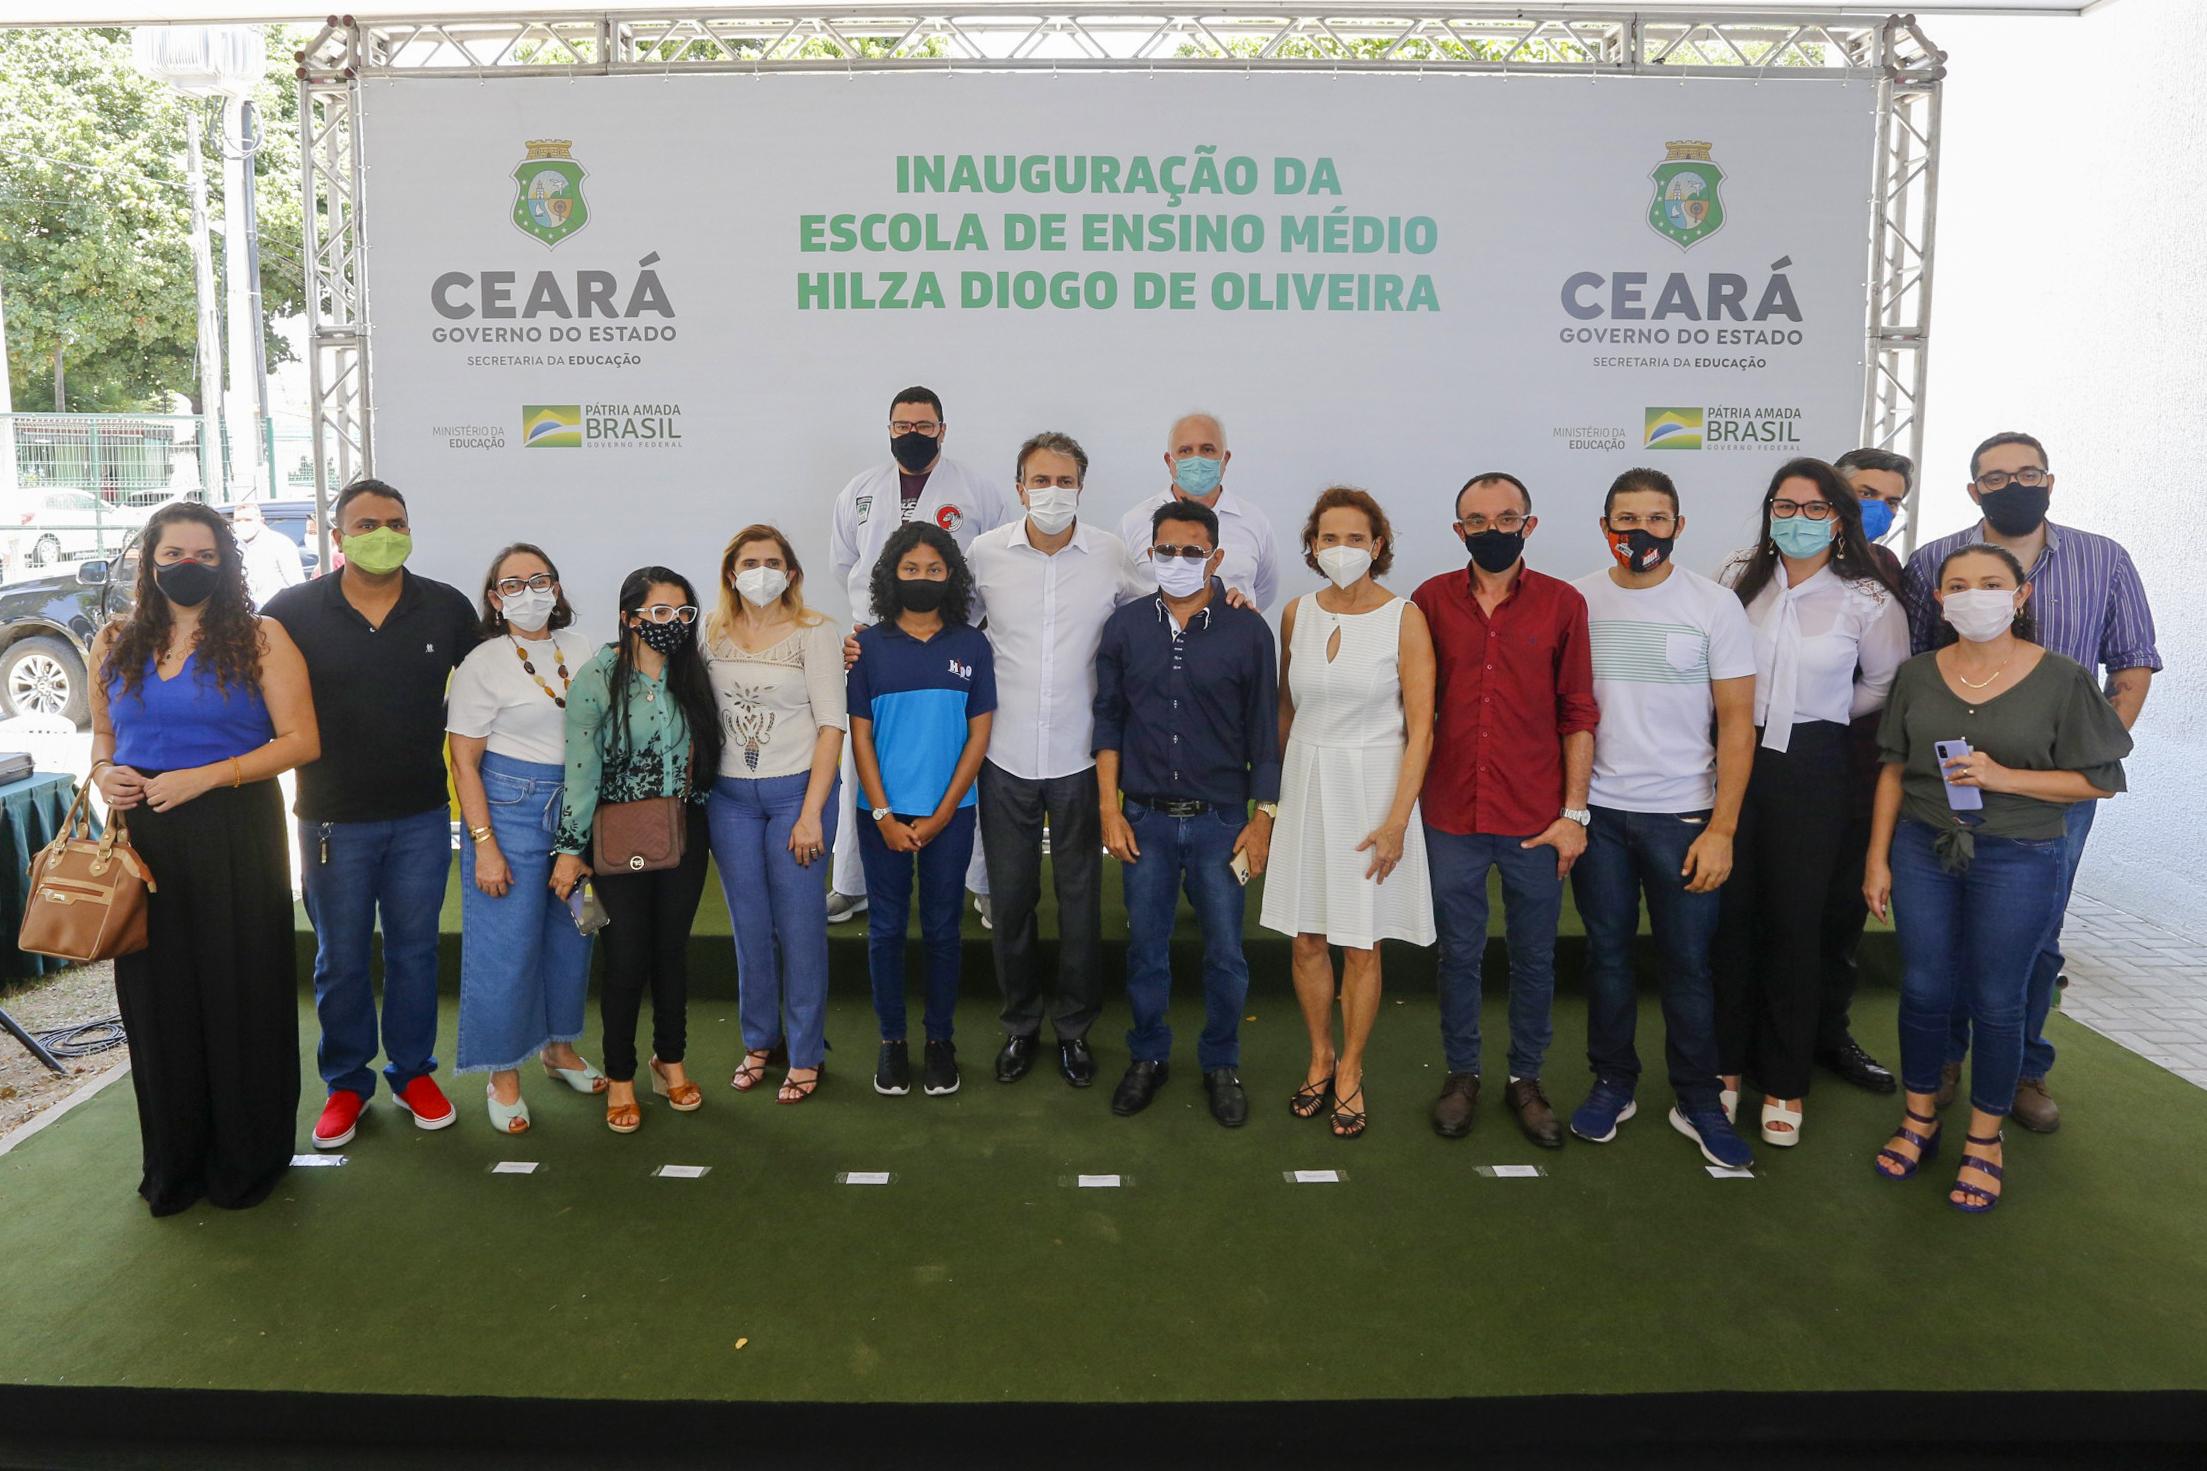 Governo do Ceará entrega nova escola de Ensino Médio para beneficiar juventude do Vila Velha, em Fortaleza